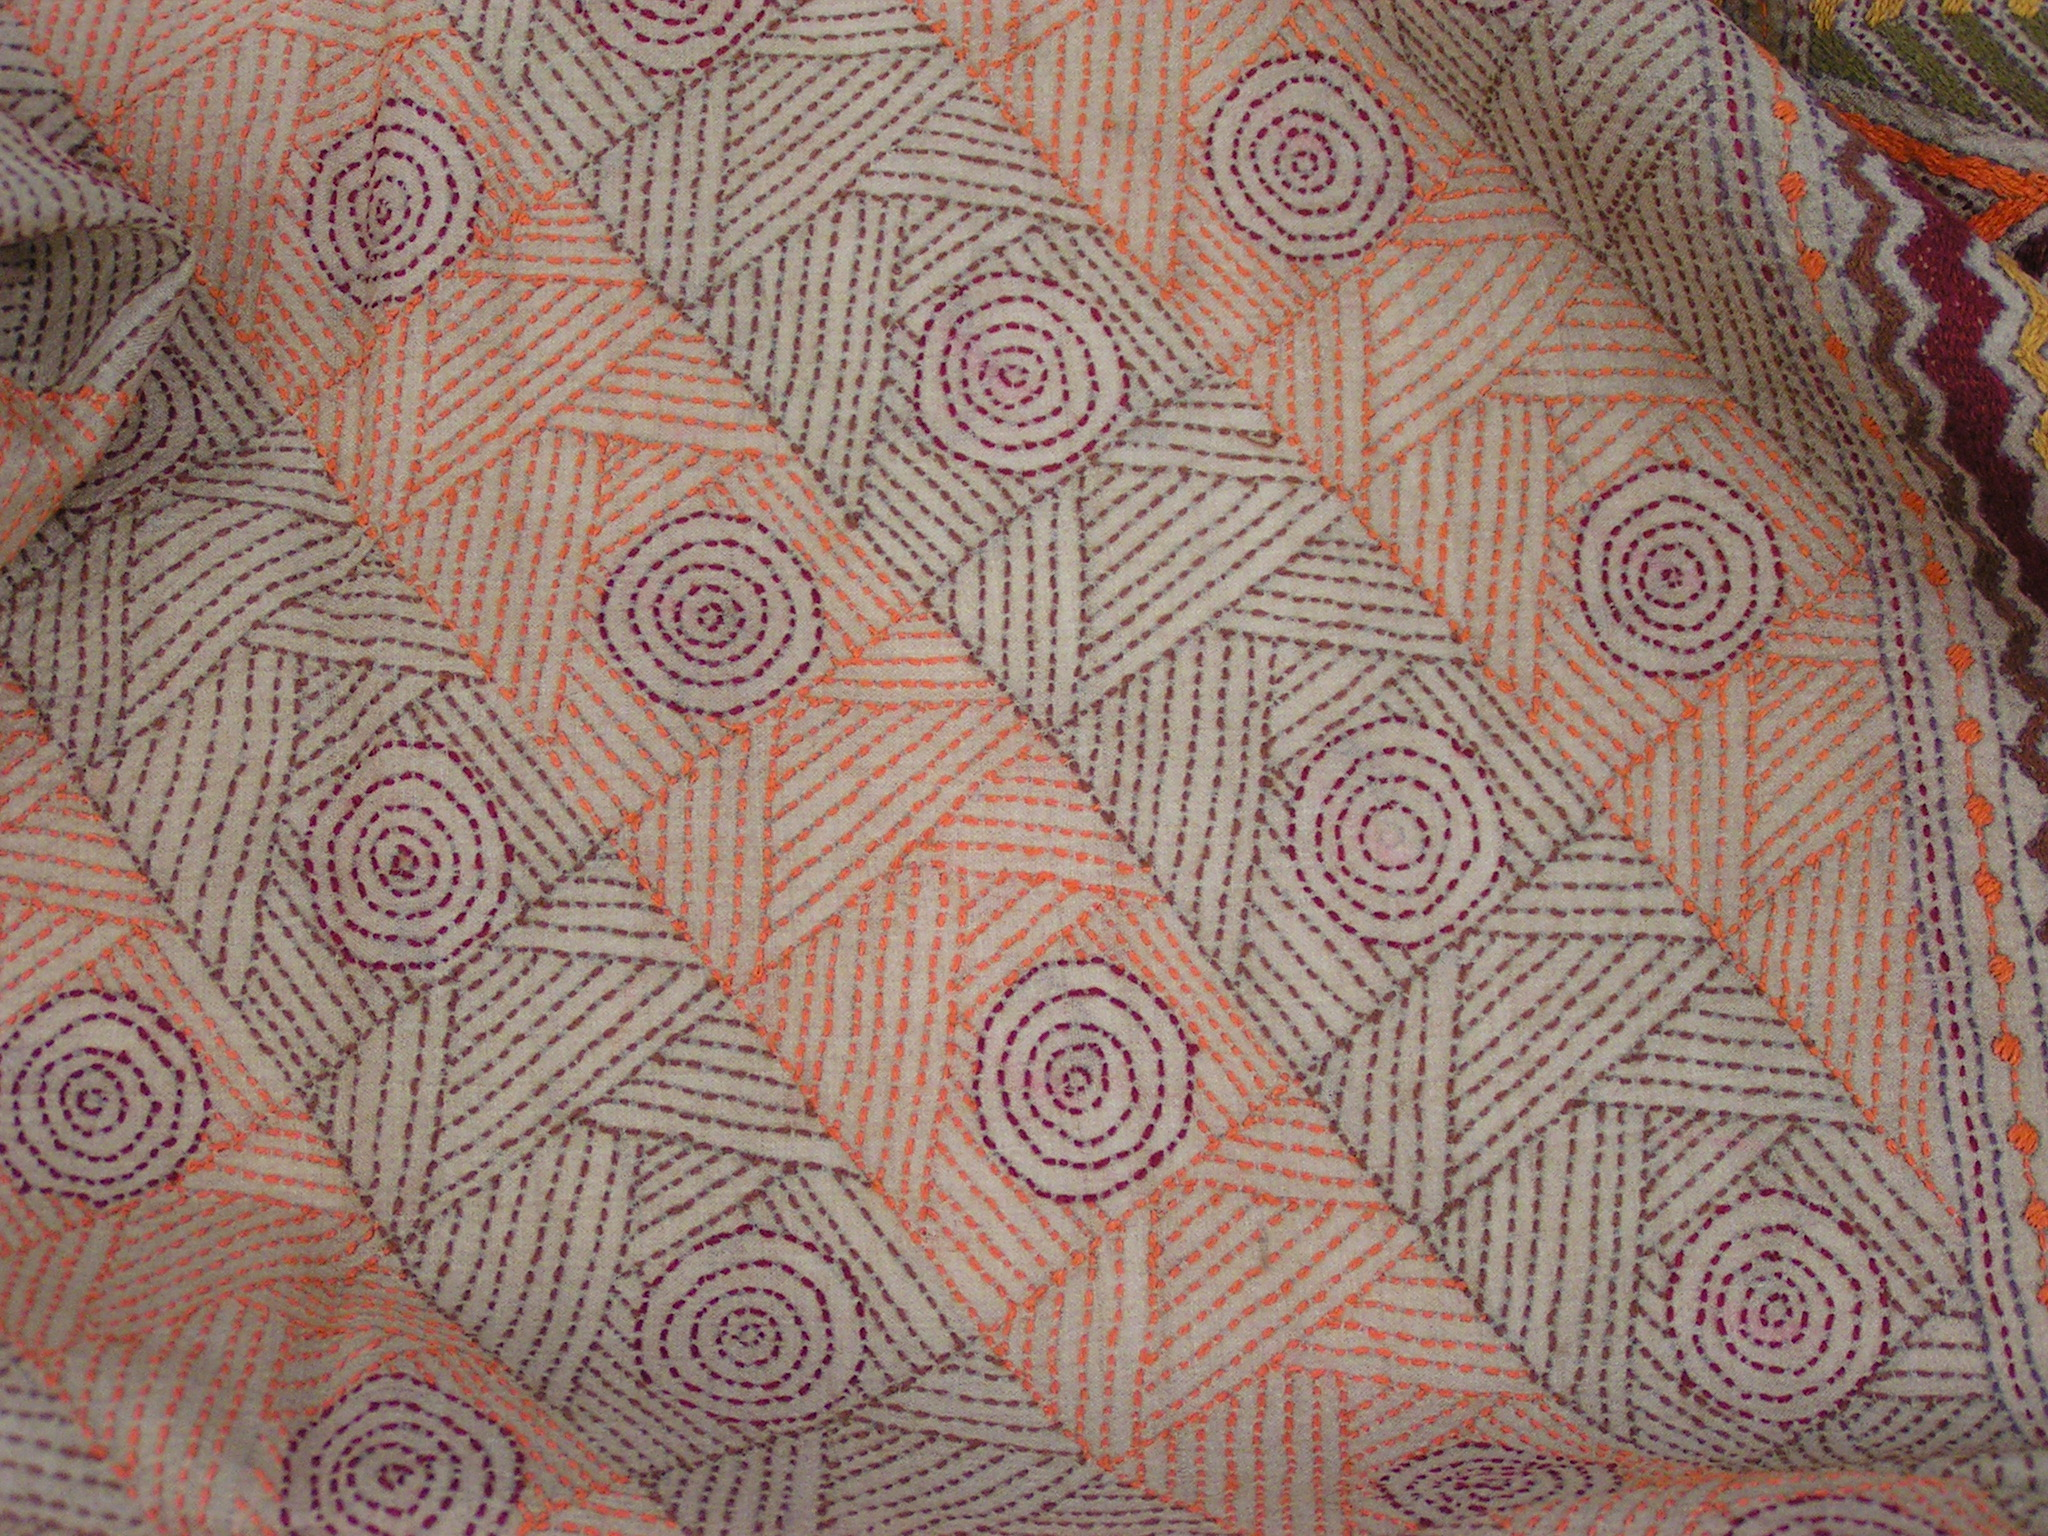 Kantha Embroidery Feltingandfiberstudio